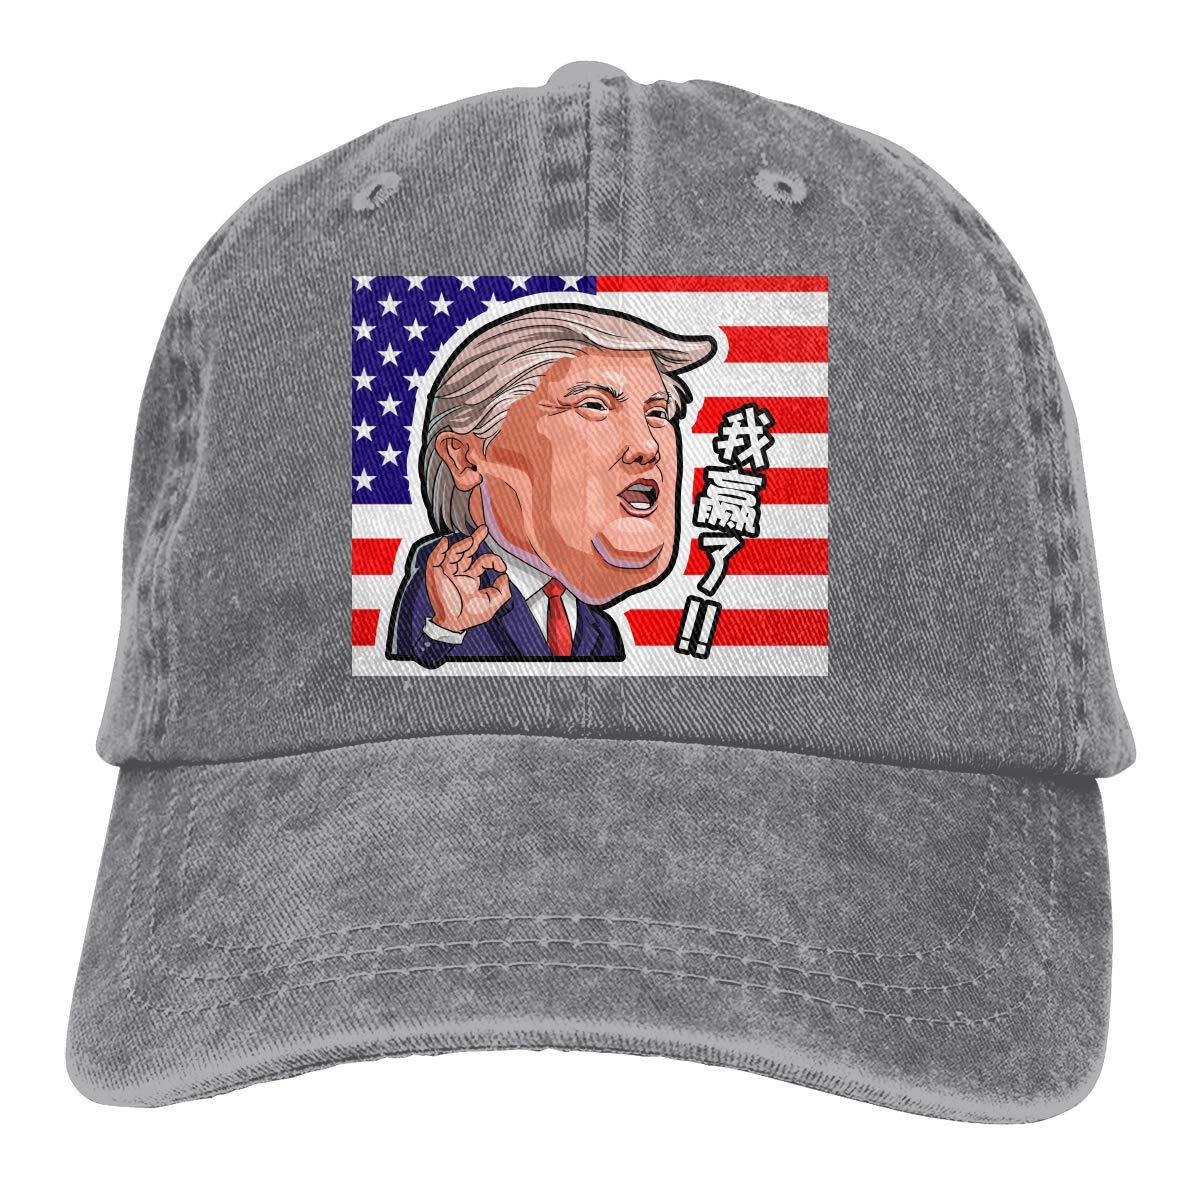 Amazon.com: Baseball Cap Gorras para Hombres Dad Cap Polo Hat Gorras De Mujer Trump 2020 Hat Casquette Black: Clothing